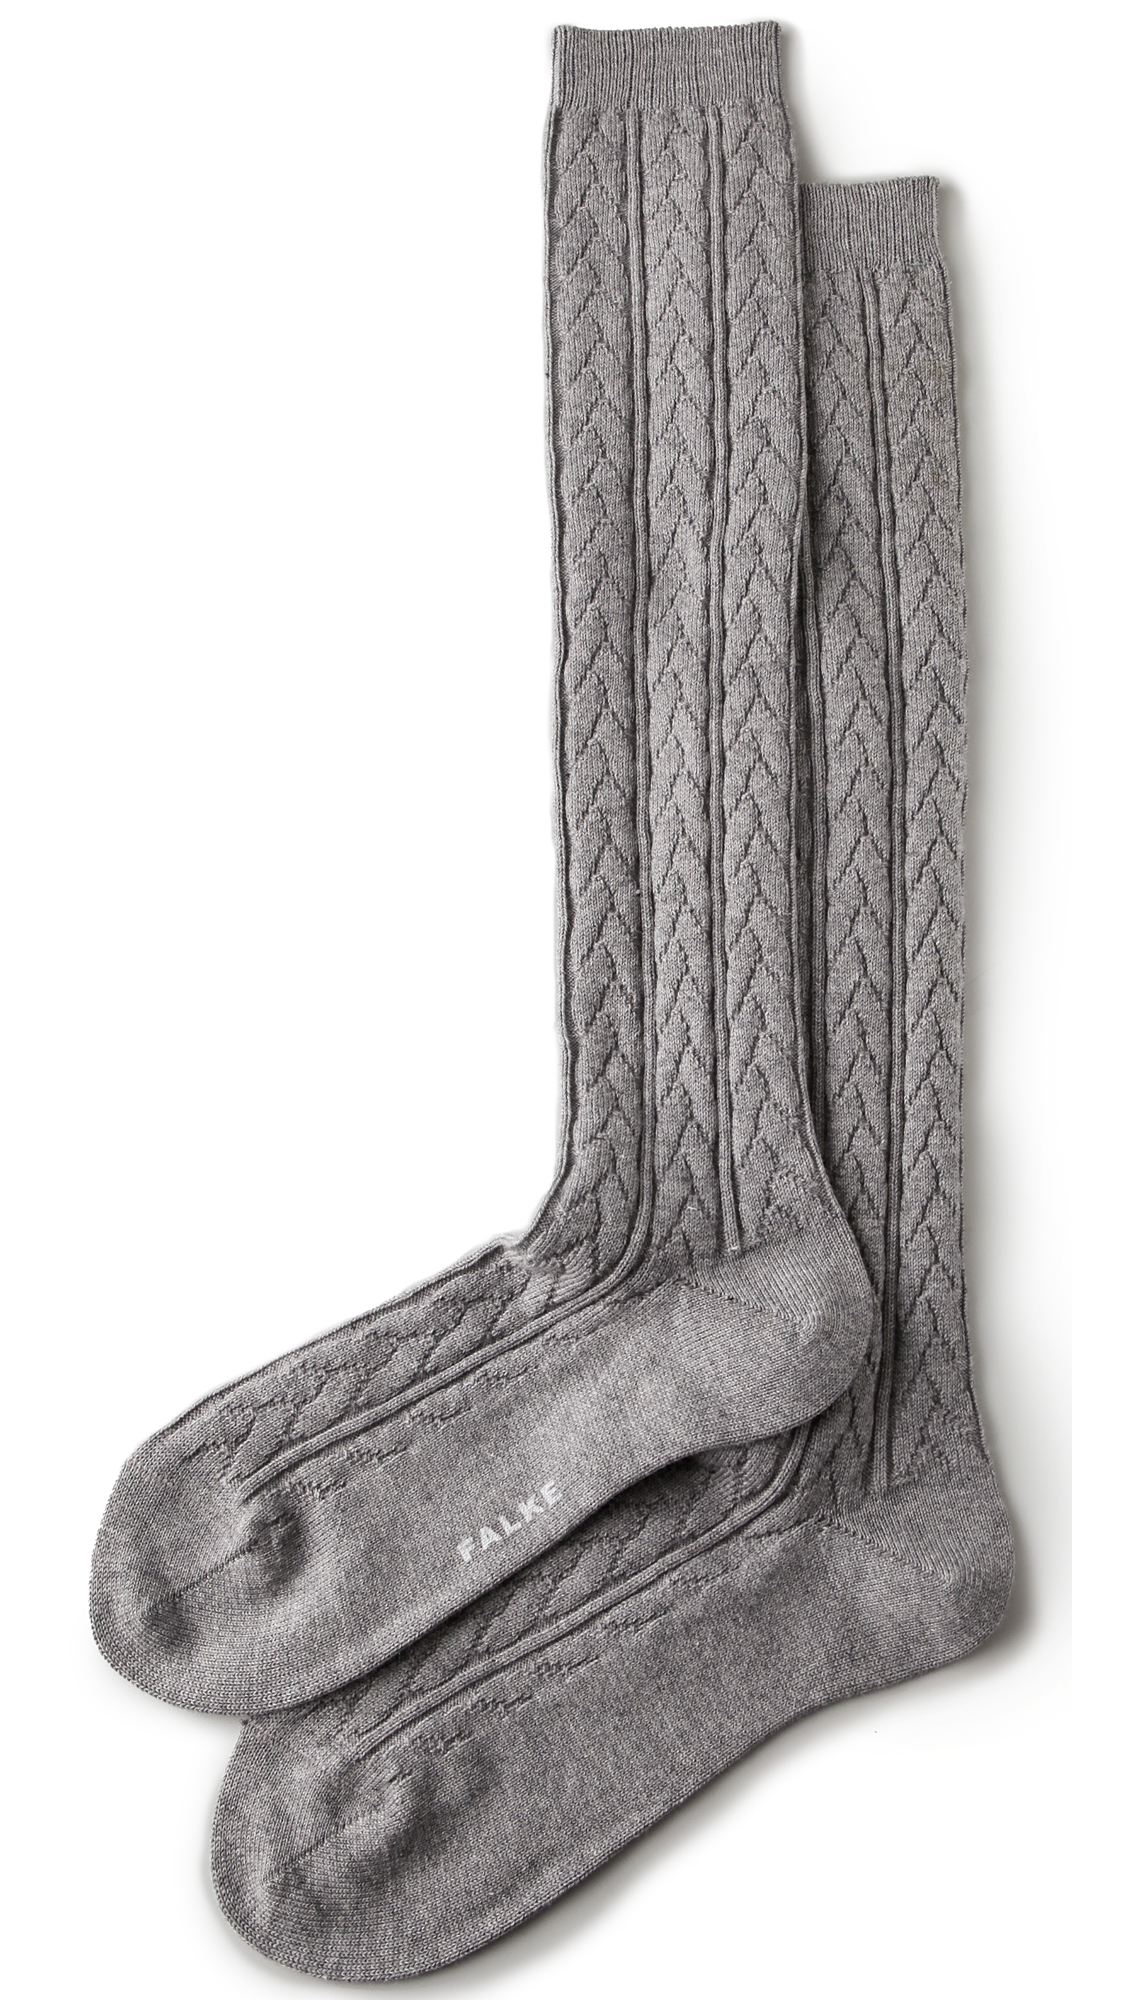 Falke Striggings Cable Knit Knee High Socks - Grey in Gray - Lyst